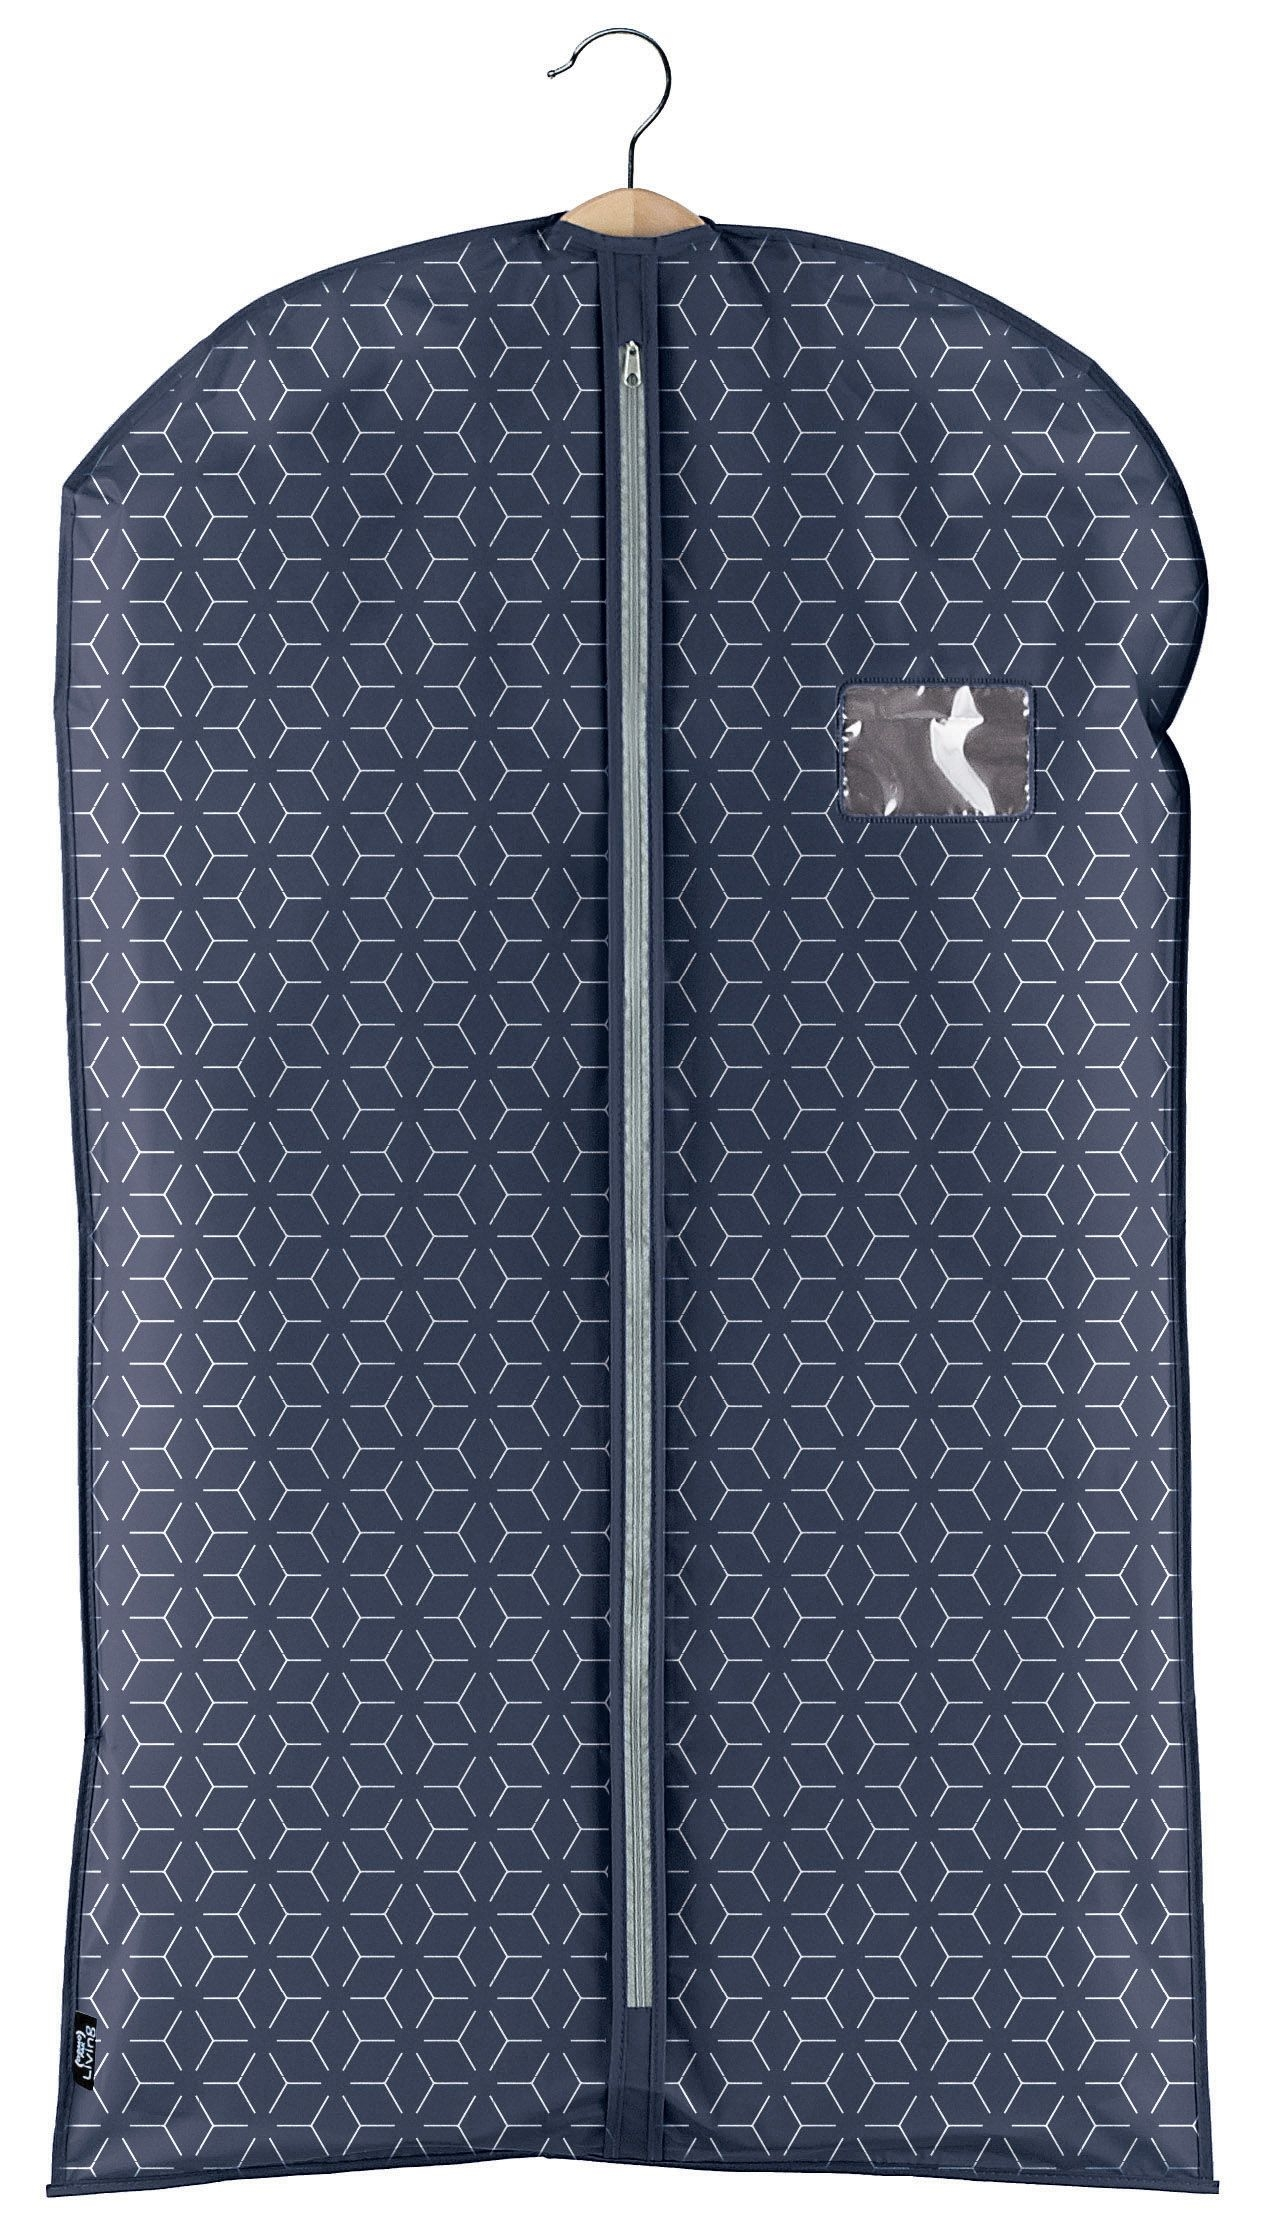 Husa pentru haine cu fermoar, Metrik Bleumarin, l60xH100 cm imagine